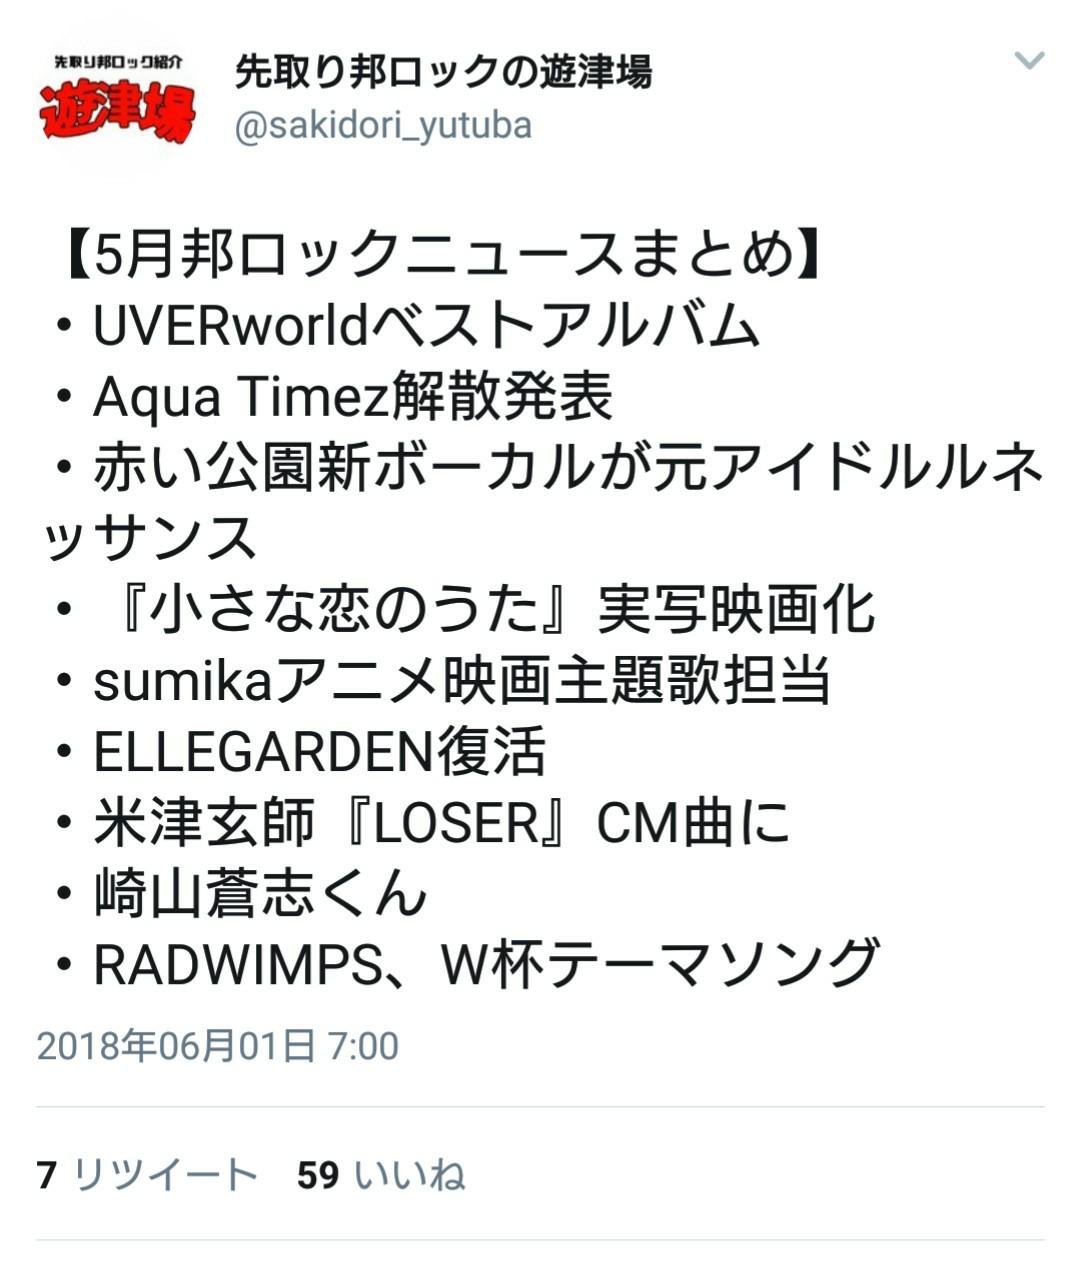 f:id:sakidoriyutsubarock:20181213223726j:plain